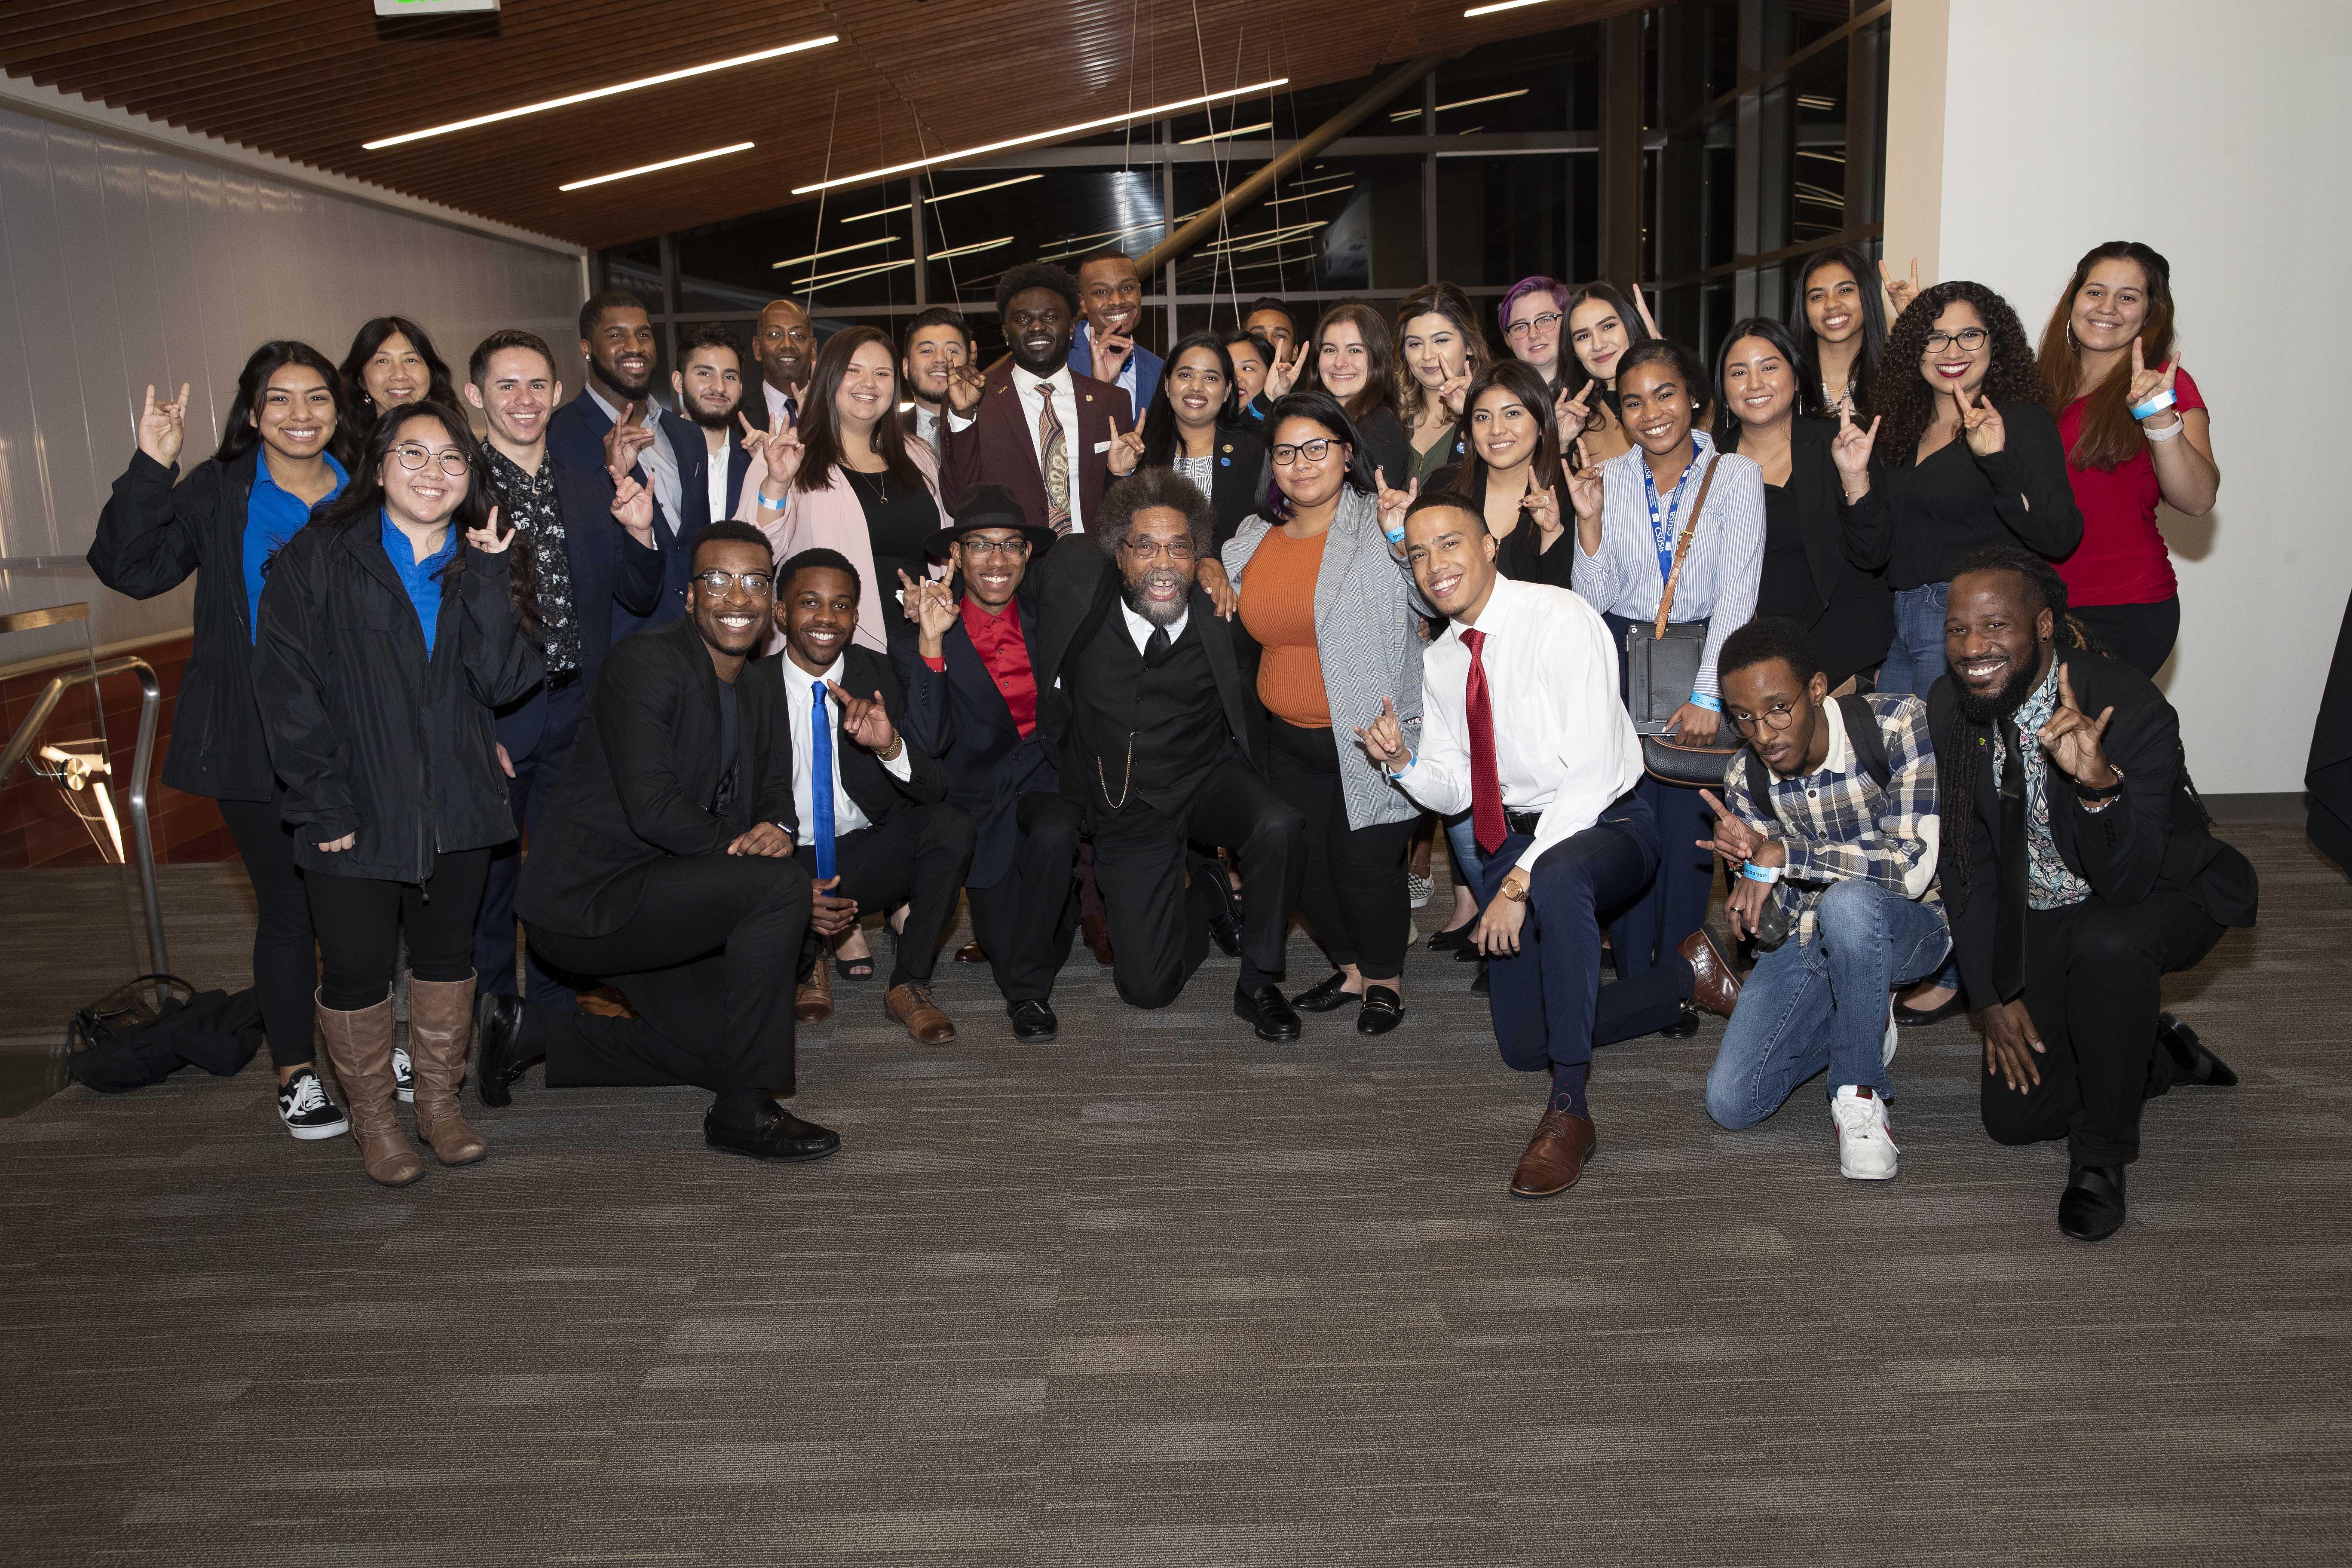 Cornel West, center, with CSUSB students, Jan. 25, 2019.